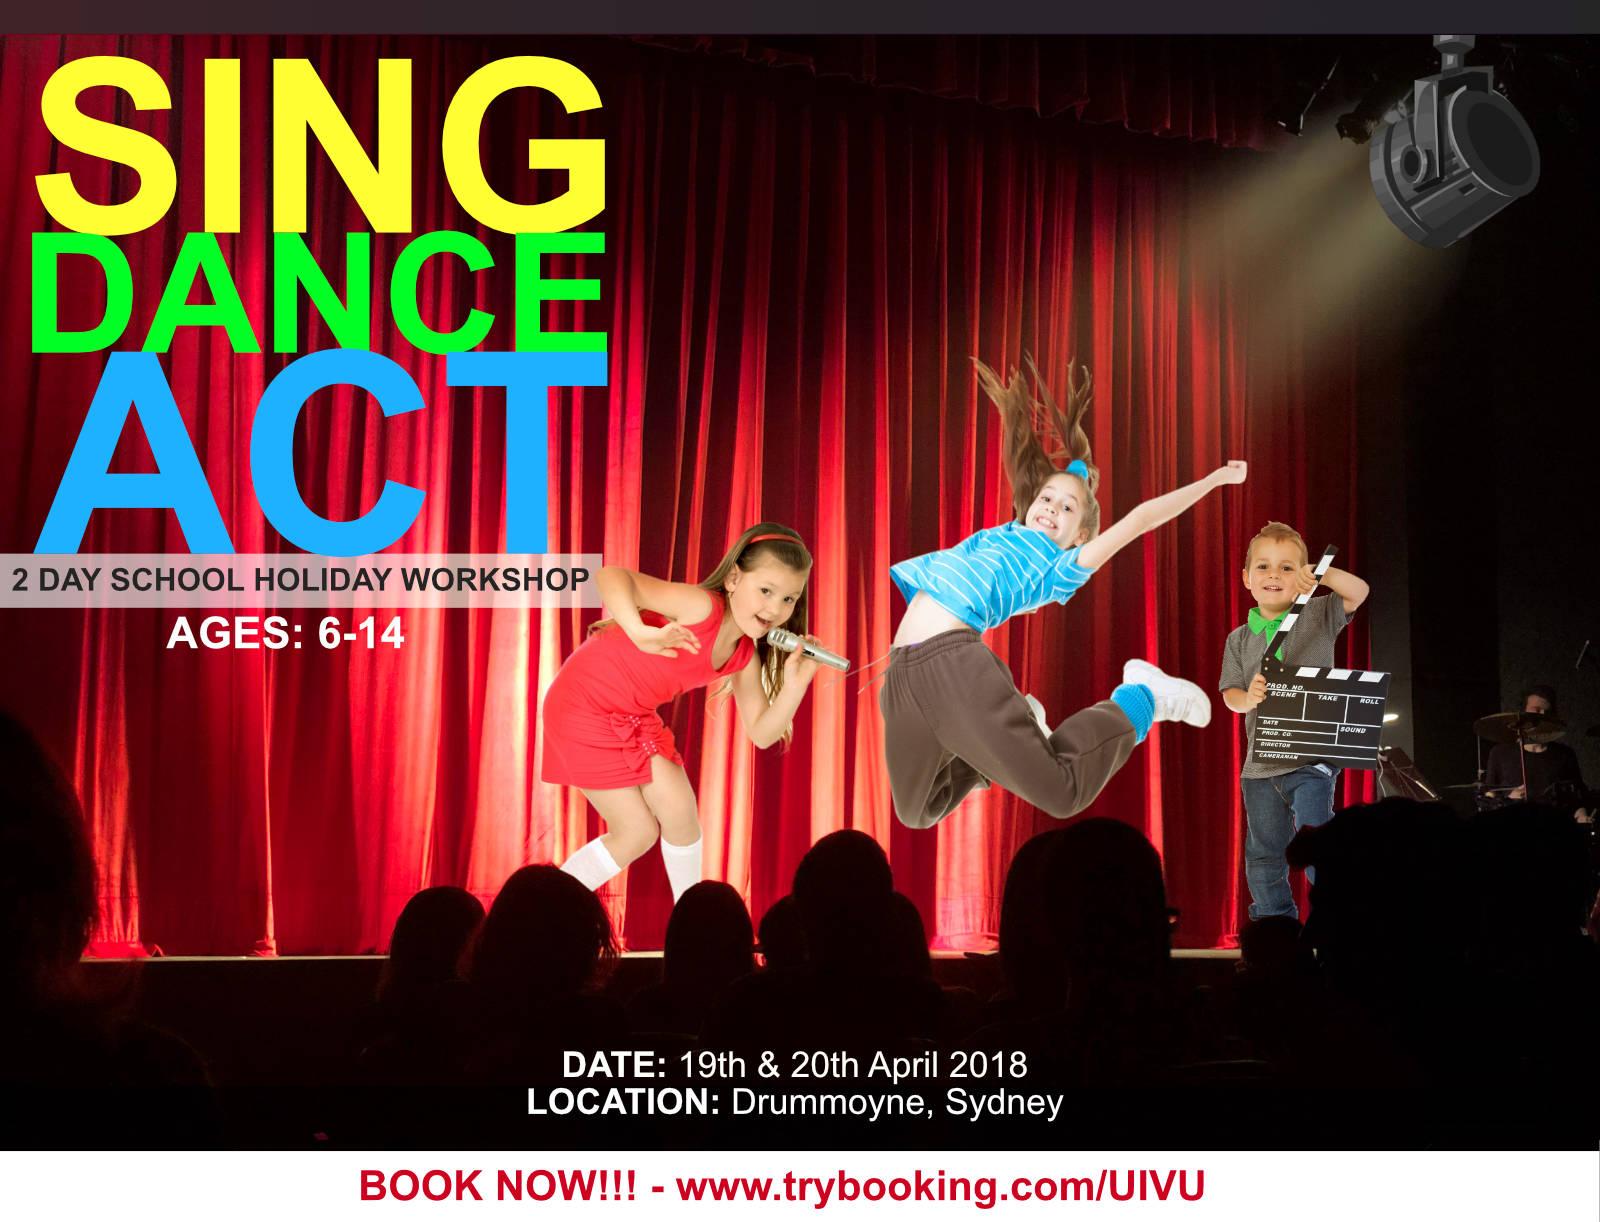 SING DANCE ACT